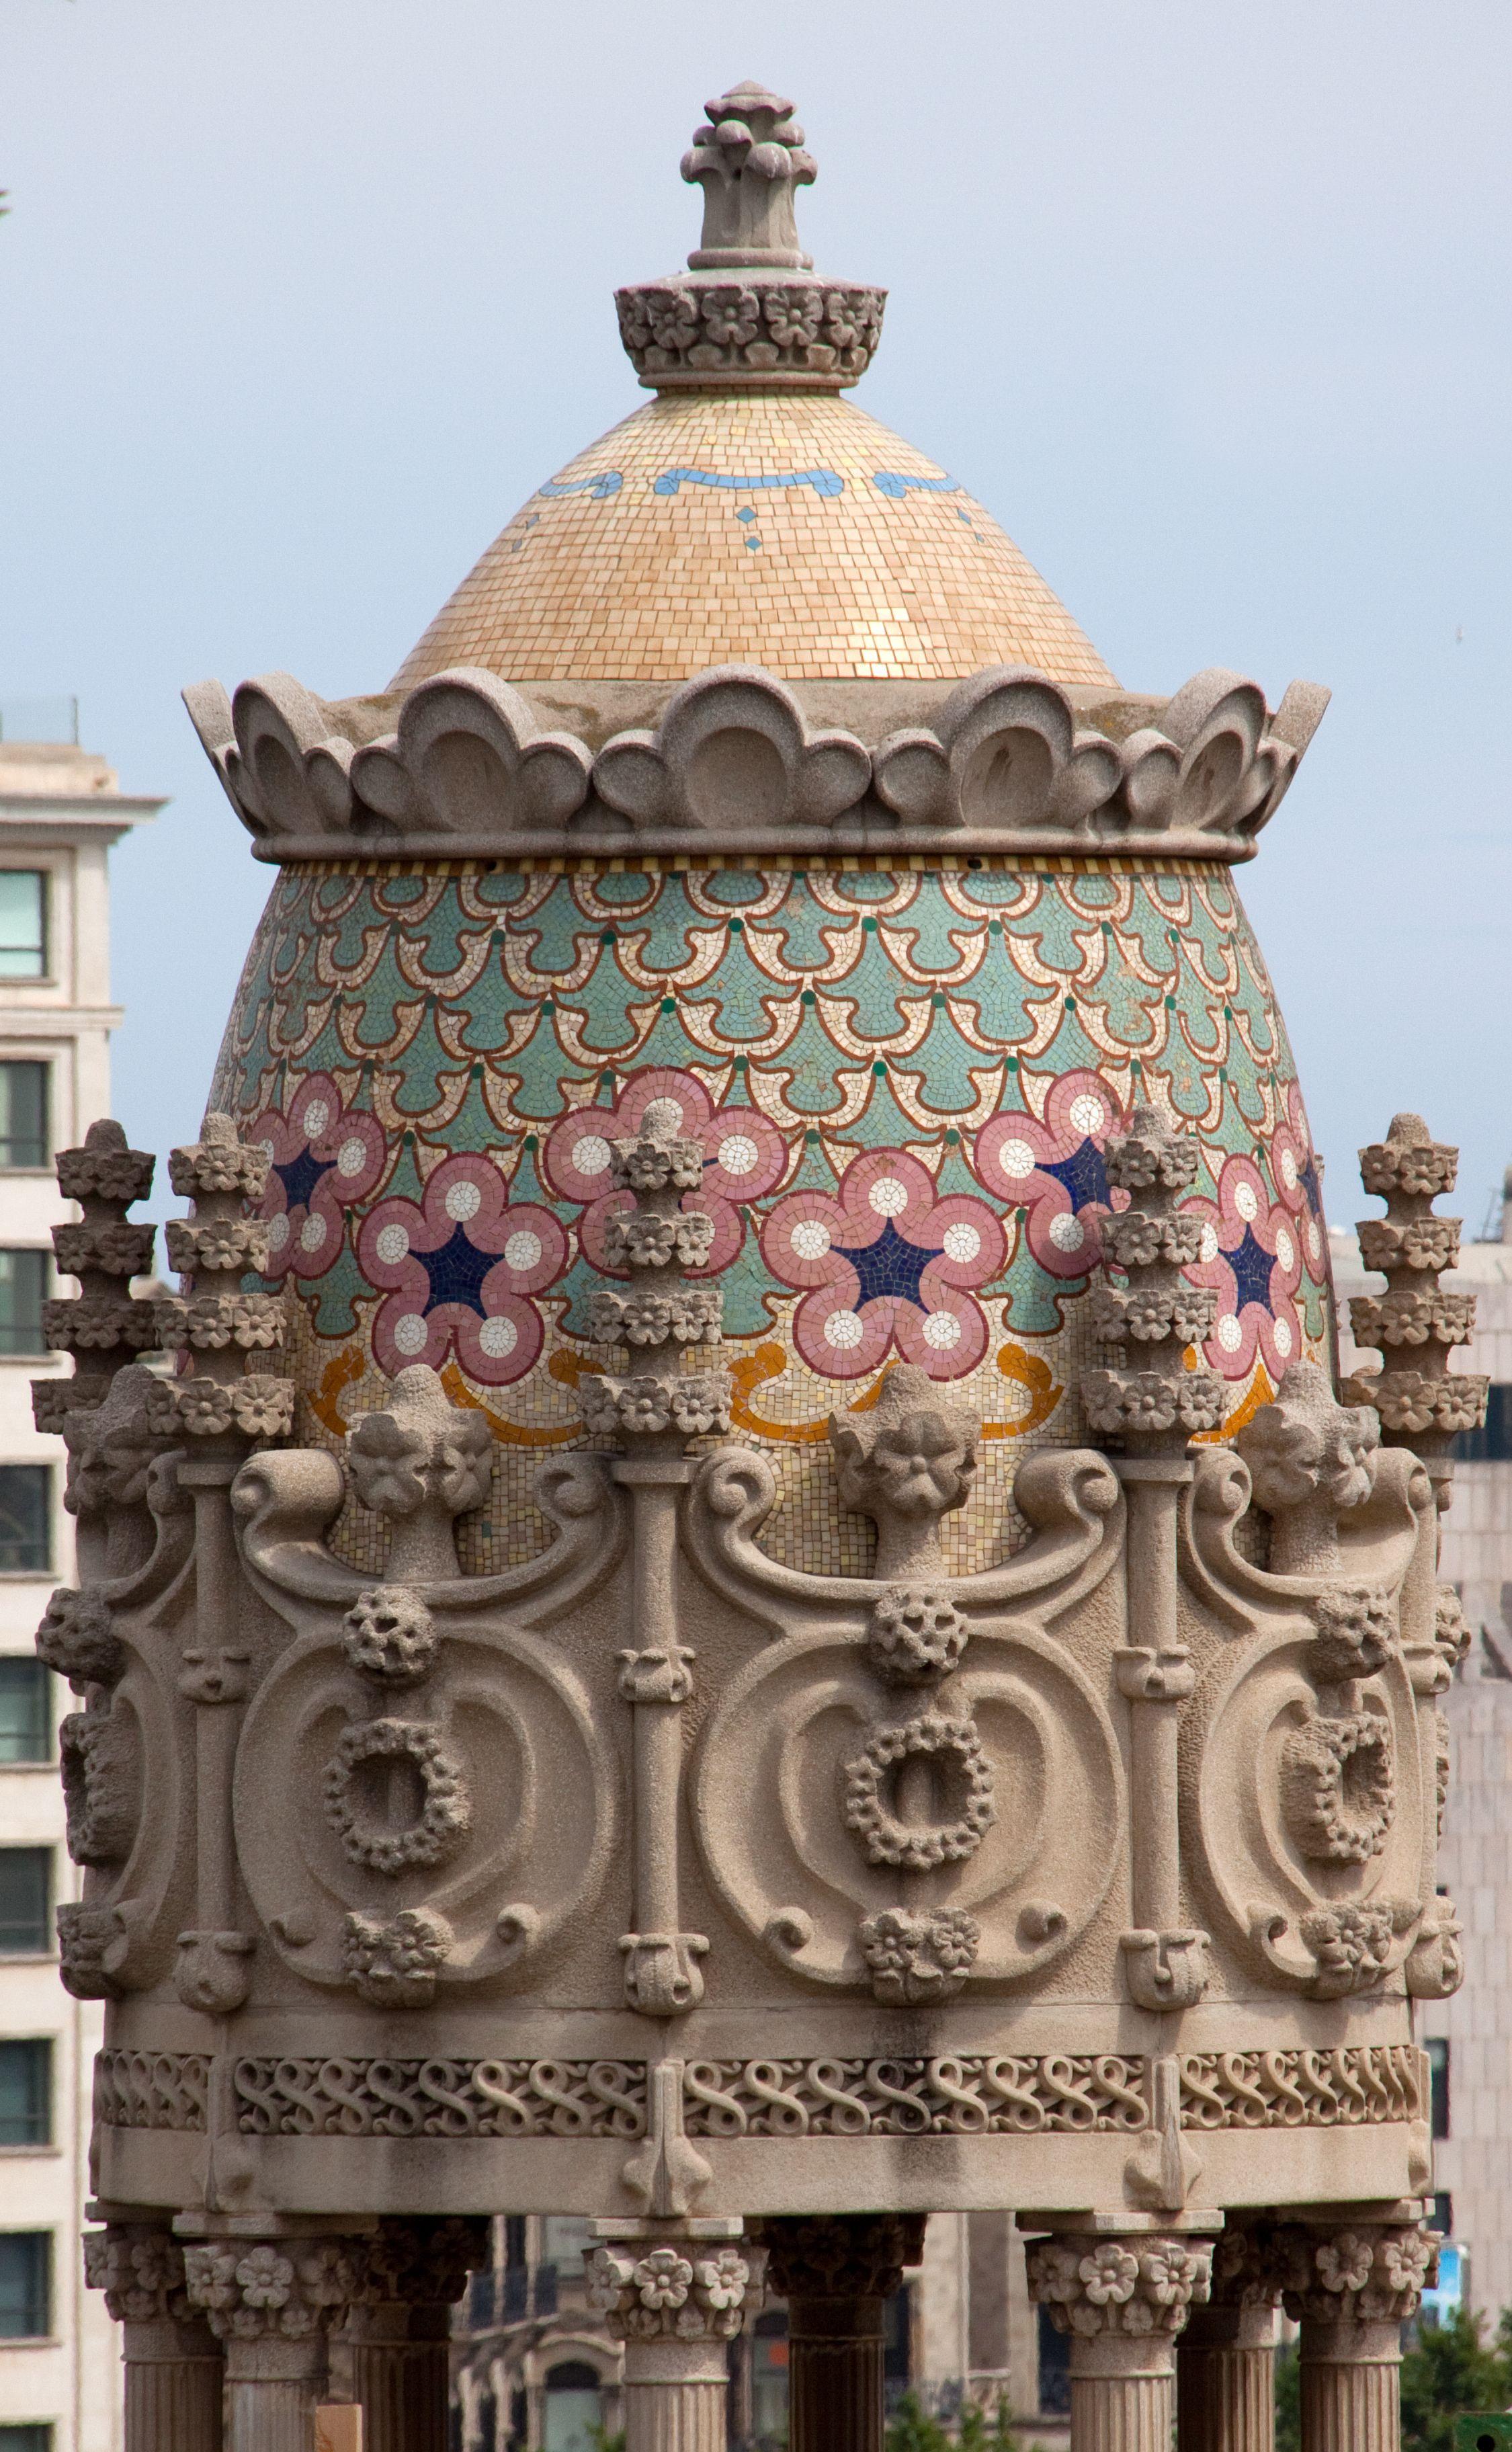 Pin by agenda cultural on espais de la cultura pinterest barcelona catalonia spain and gaudi - Agenda cultura barcelona ...